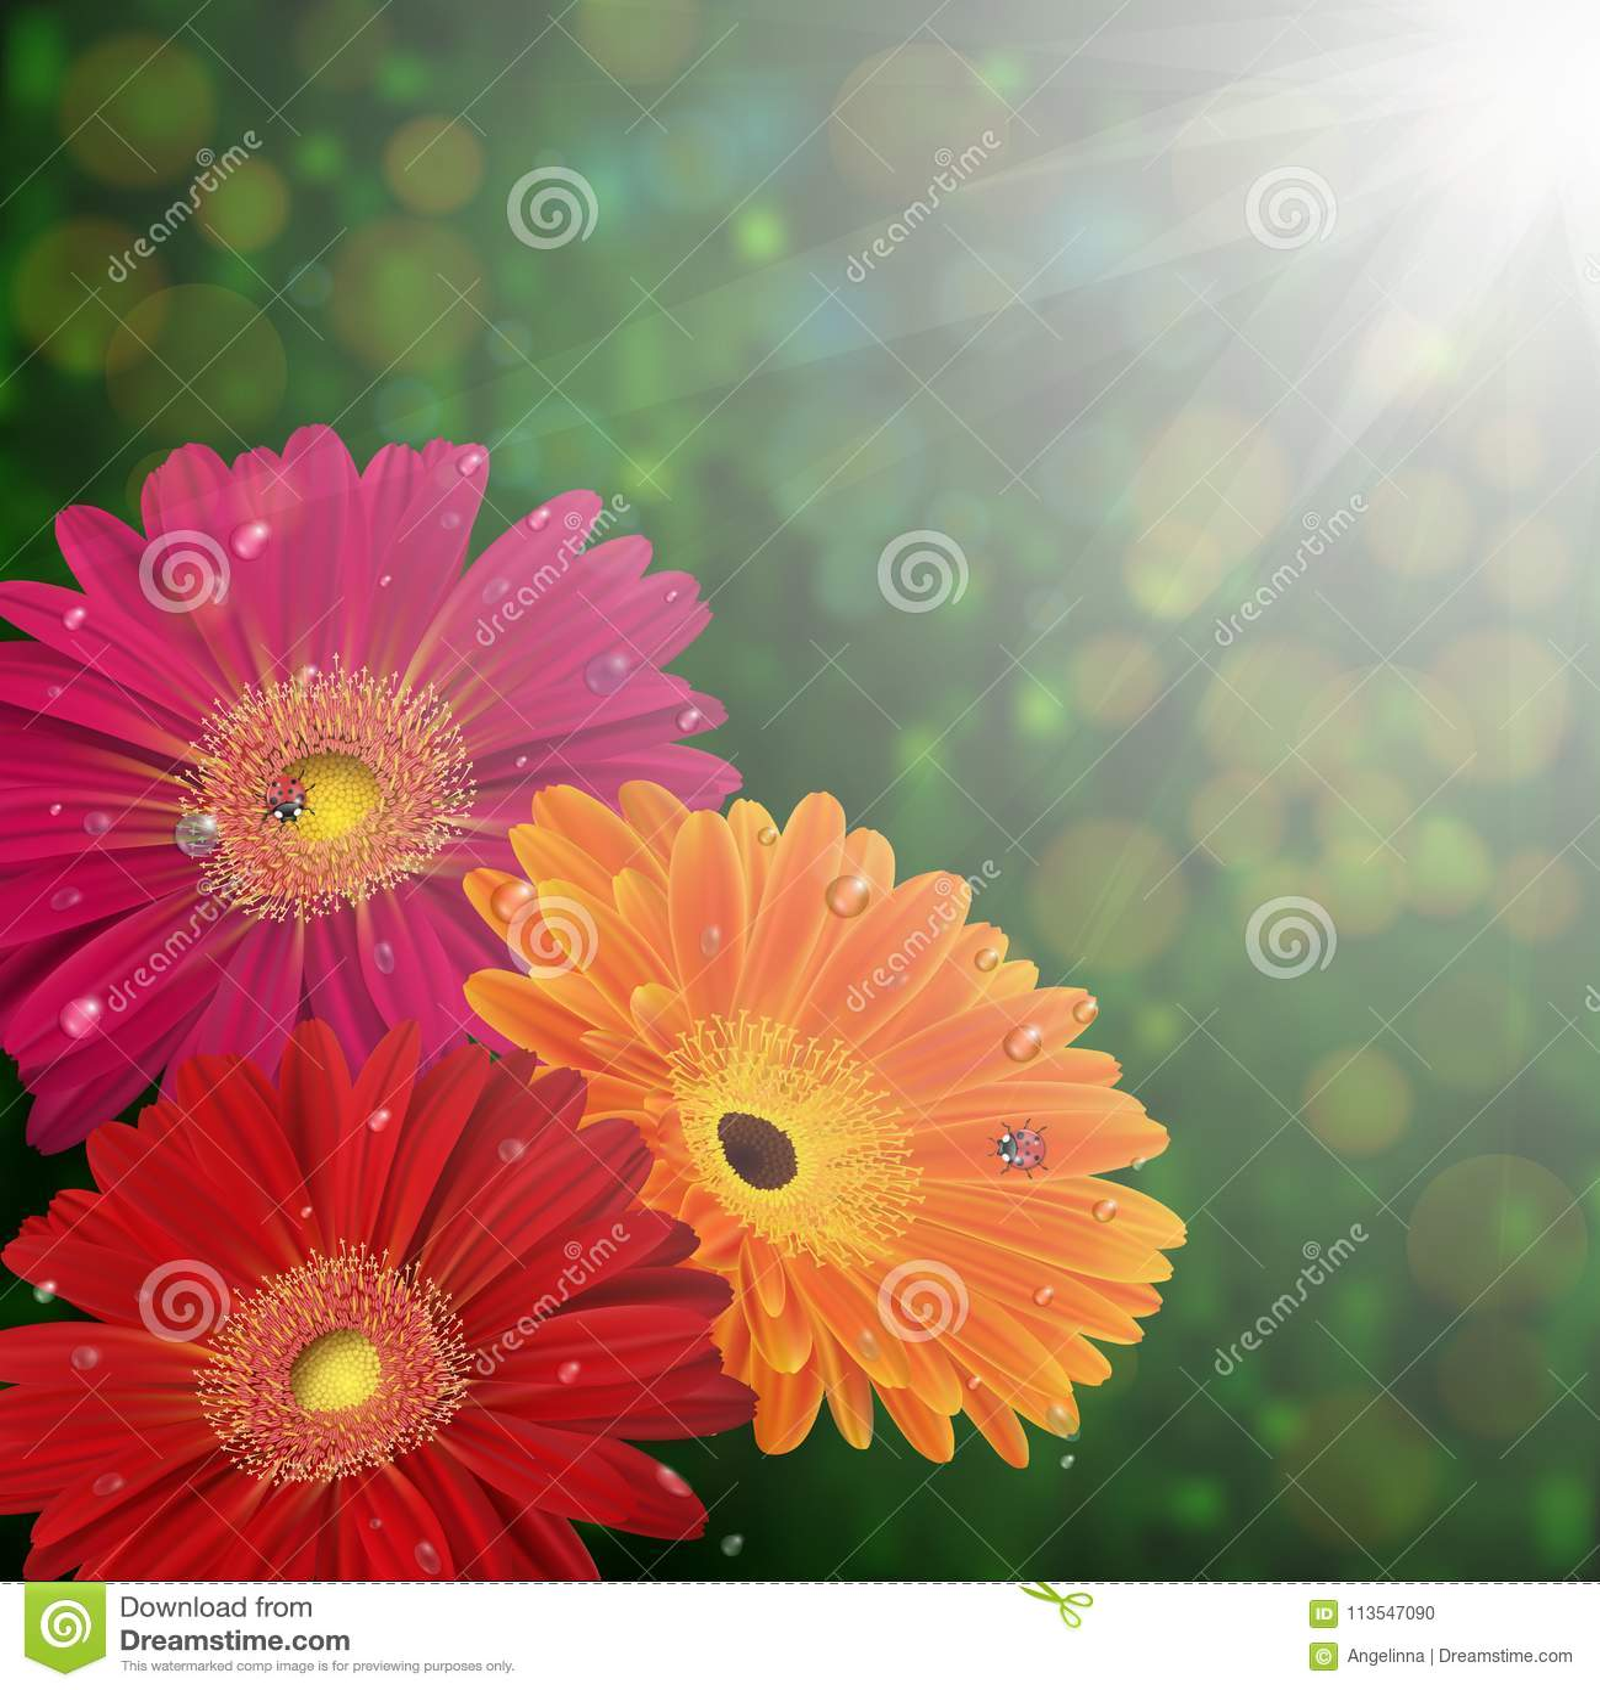 floral card template stock vector illustration of gerbera 113547090